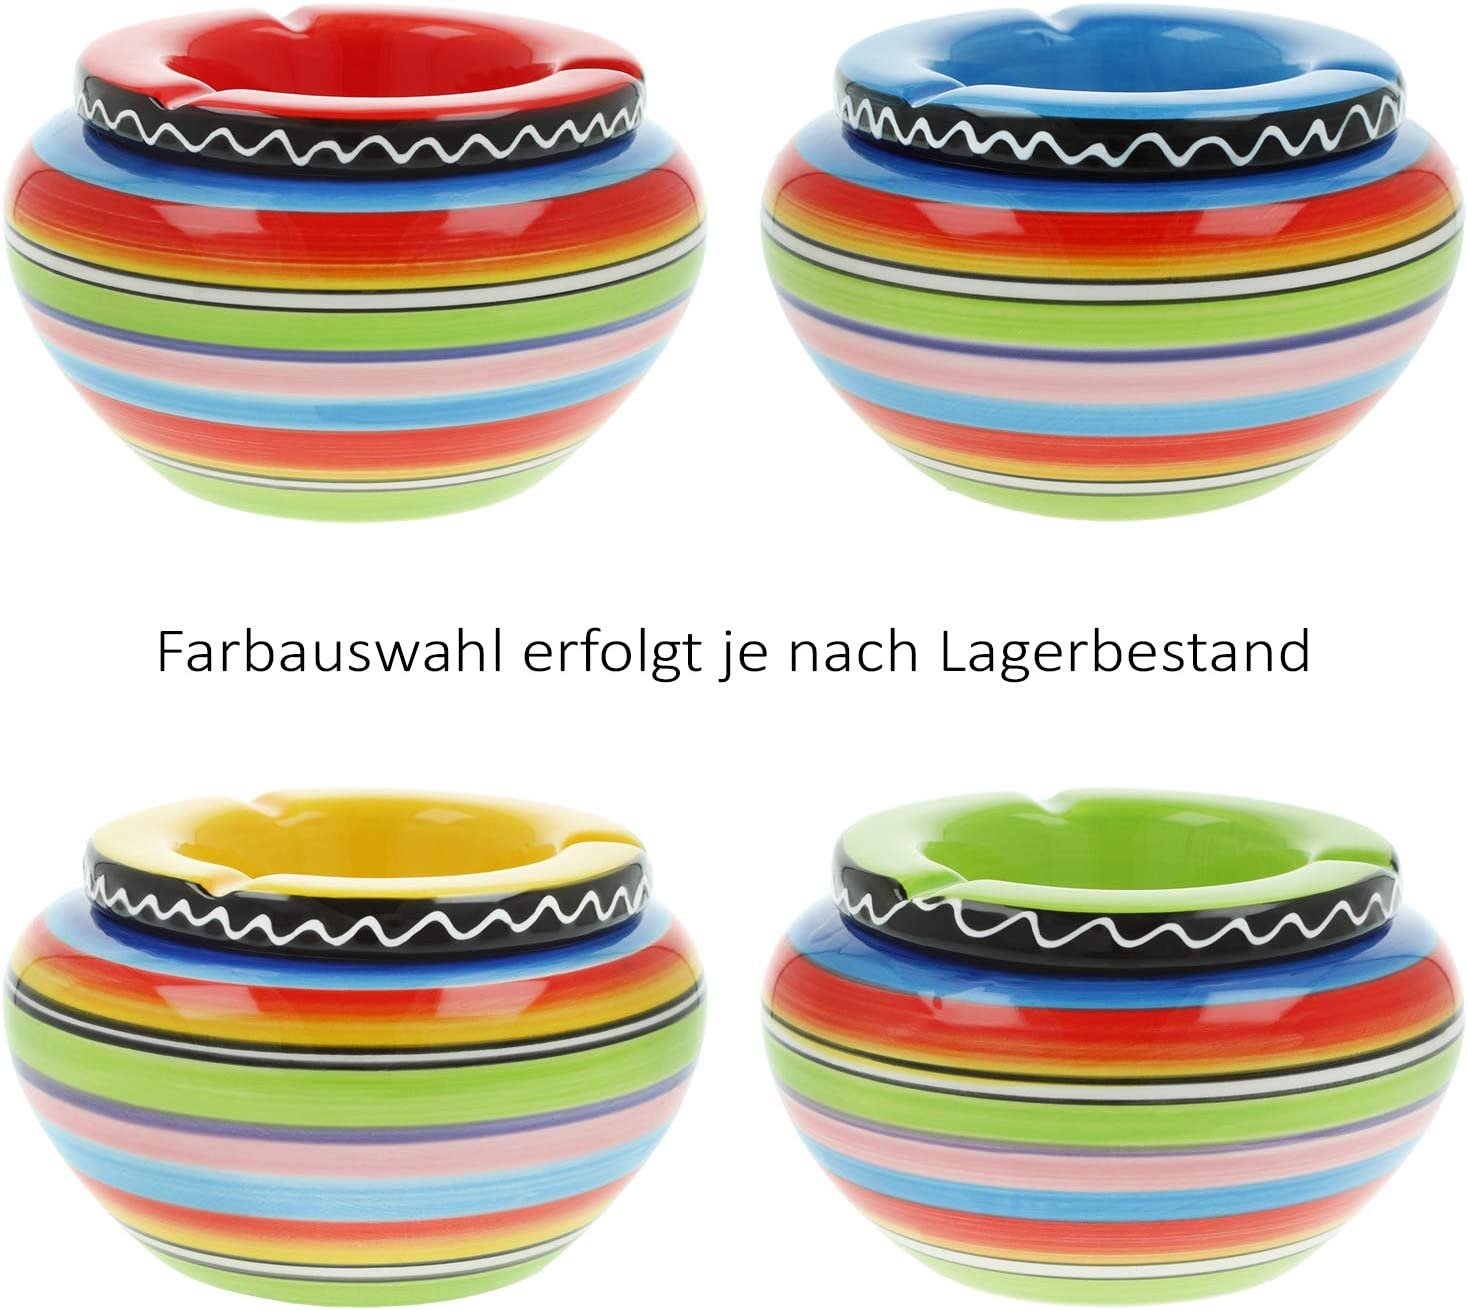 com-four/® 2X Windaschenbecher aus feinster Dolomit Keramik bunt gestreift Auswahl variiert /Ø 14 x H 8 cm 02 St/ück - /Ø 14 cm bunt